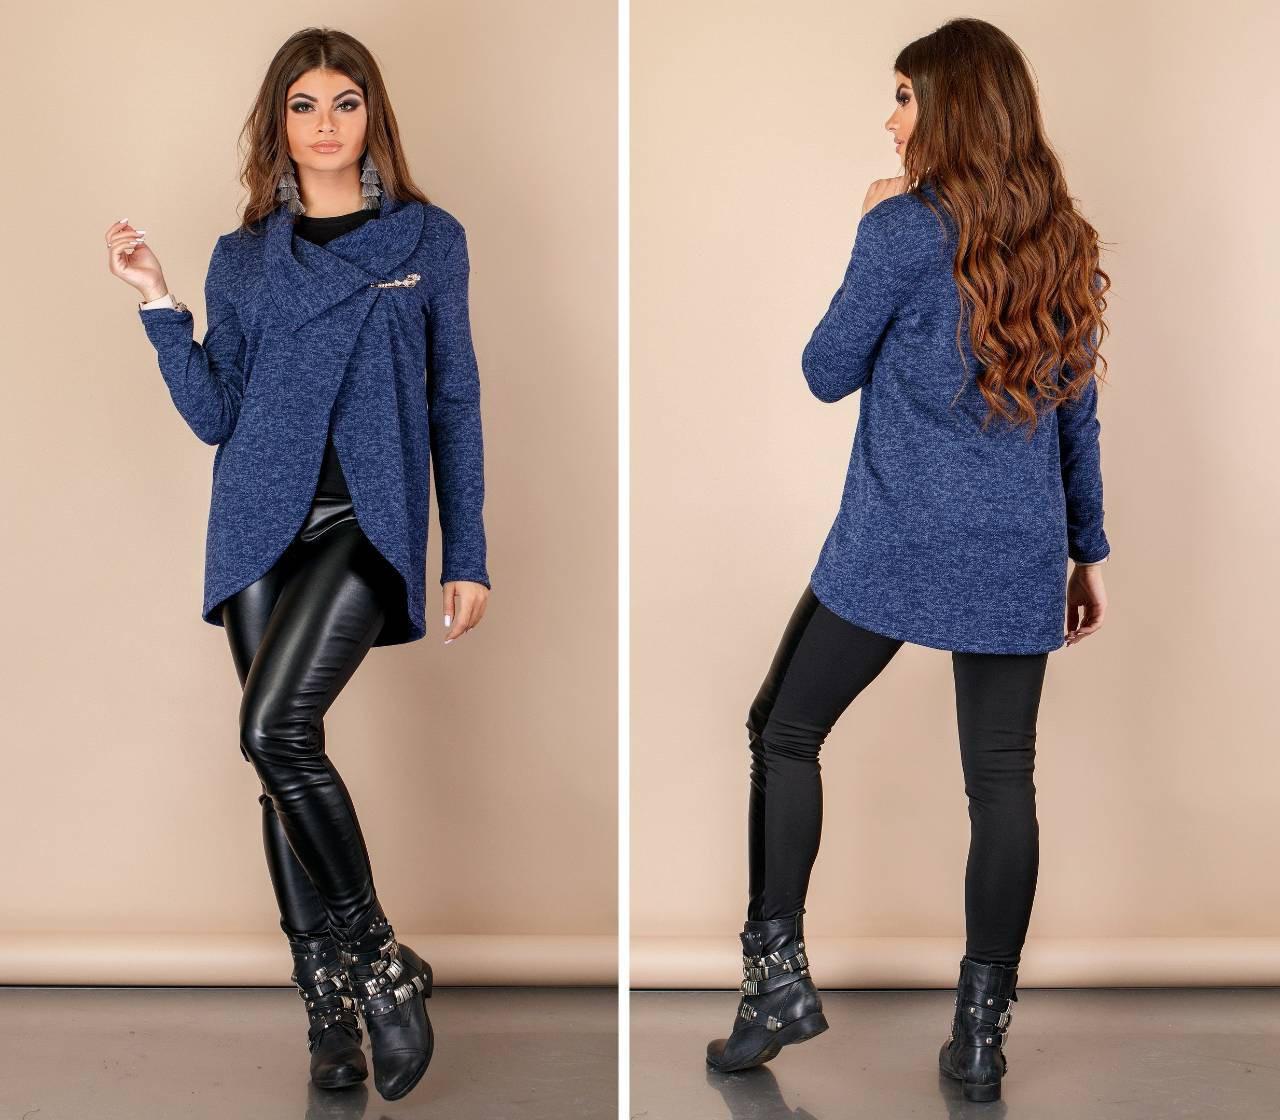 Кардиган женский с брошкой, модель 133, цвет - синий